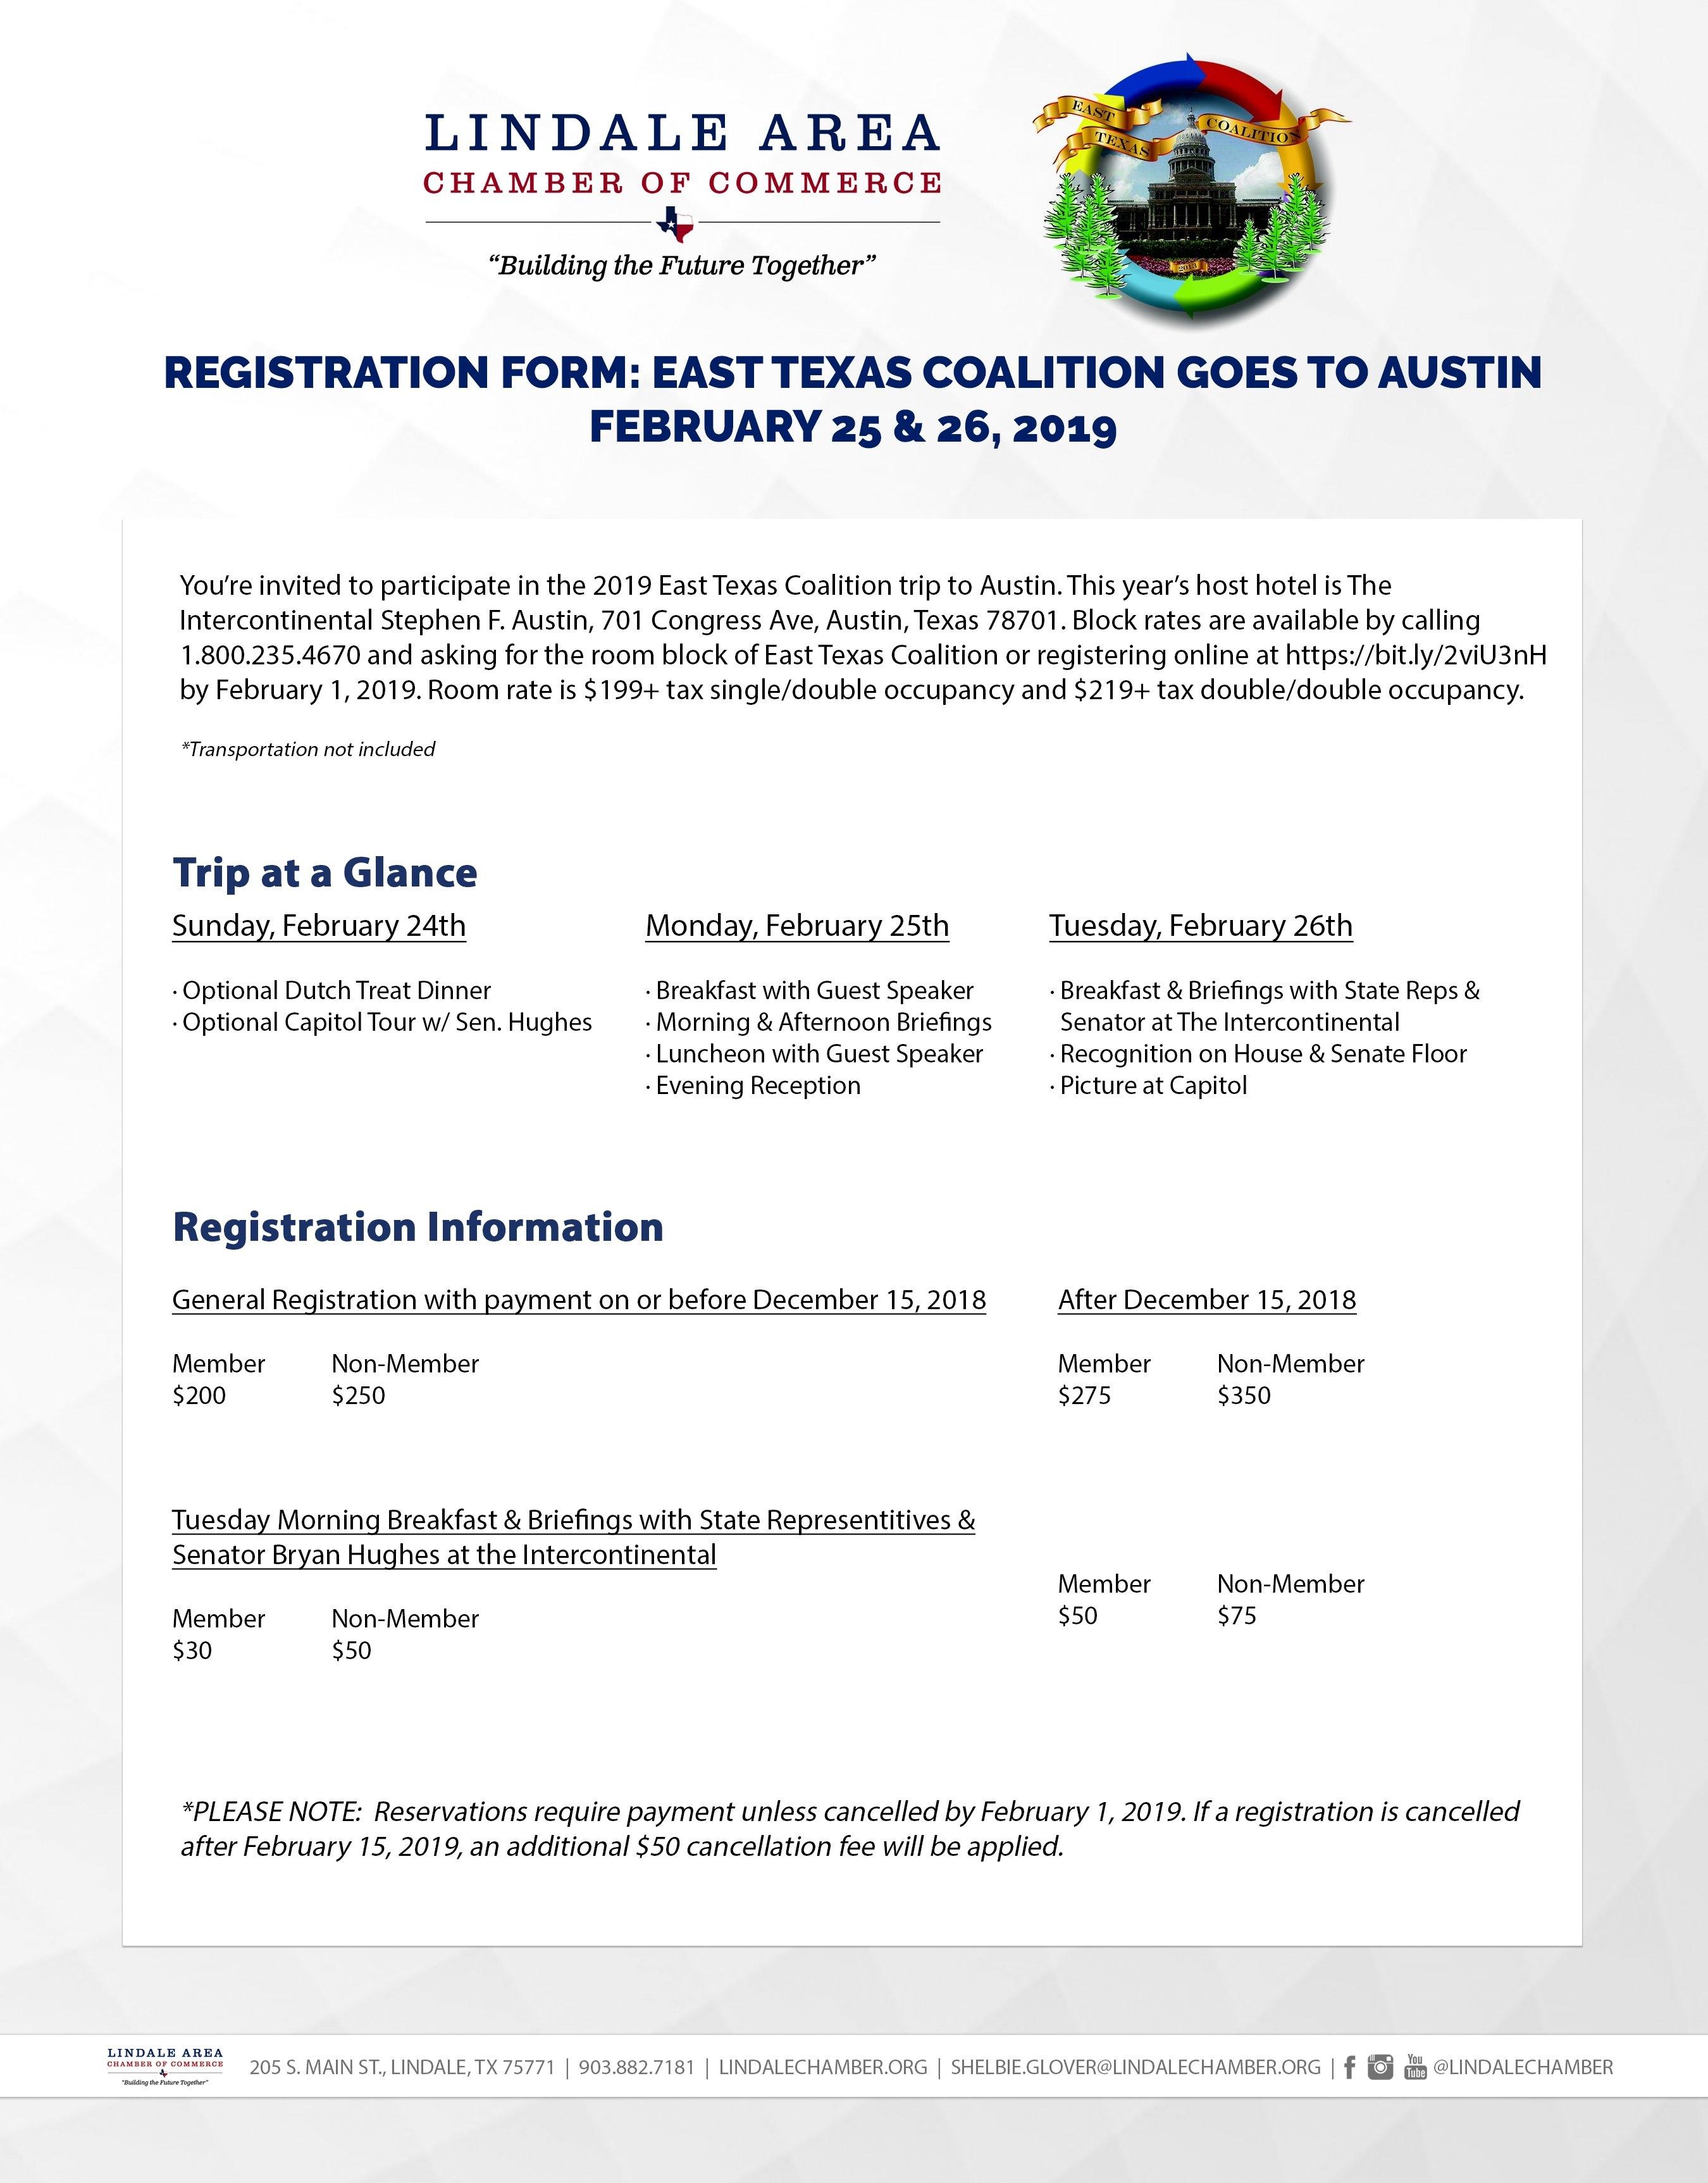 East Texas Coalition Goes To Austin – Feb 25, 2019 To Feb 26, 2019 Stephen F Austin Calendar 2019